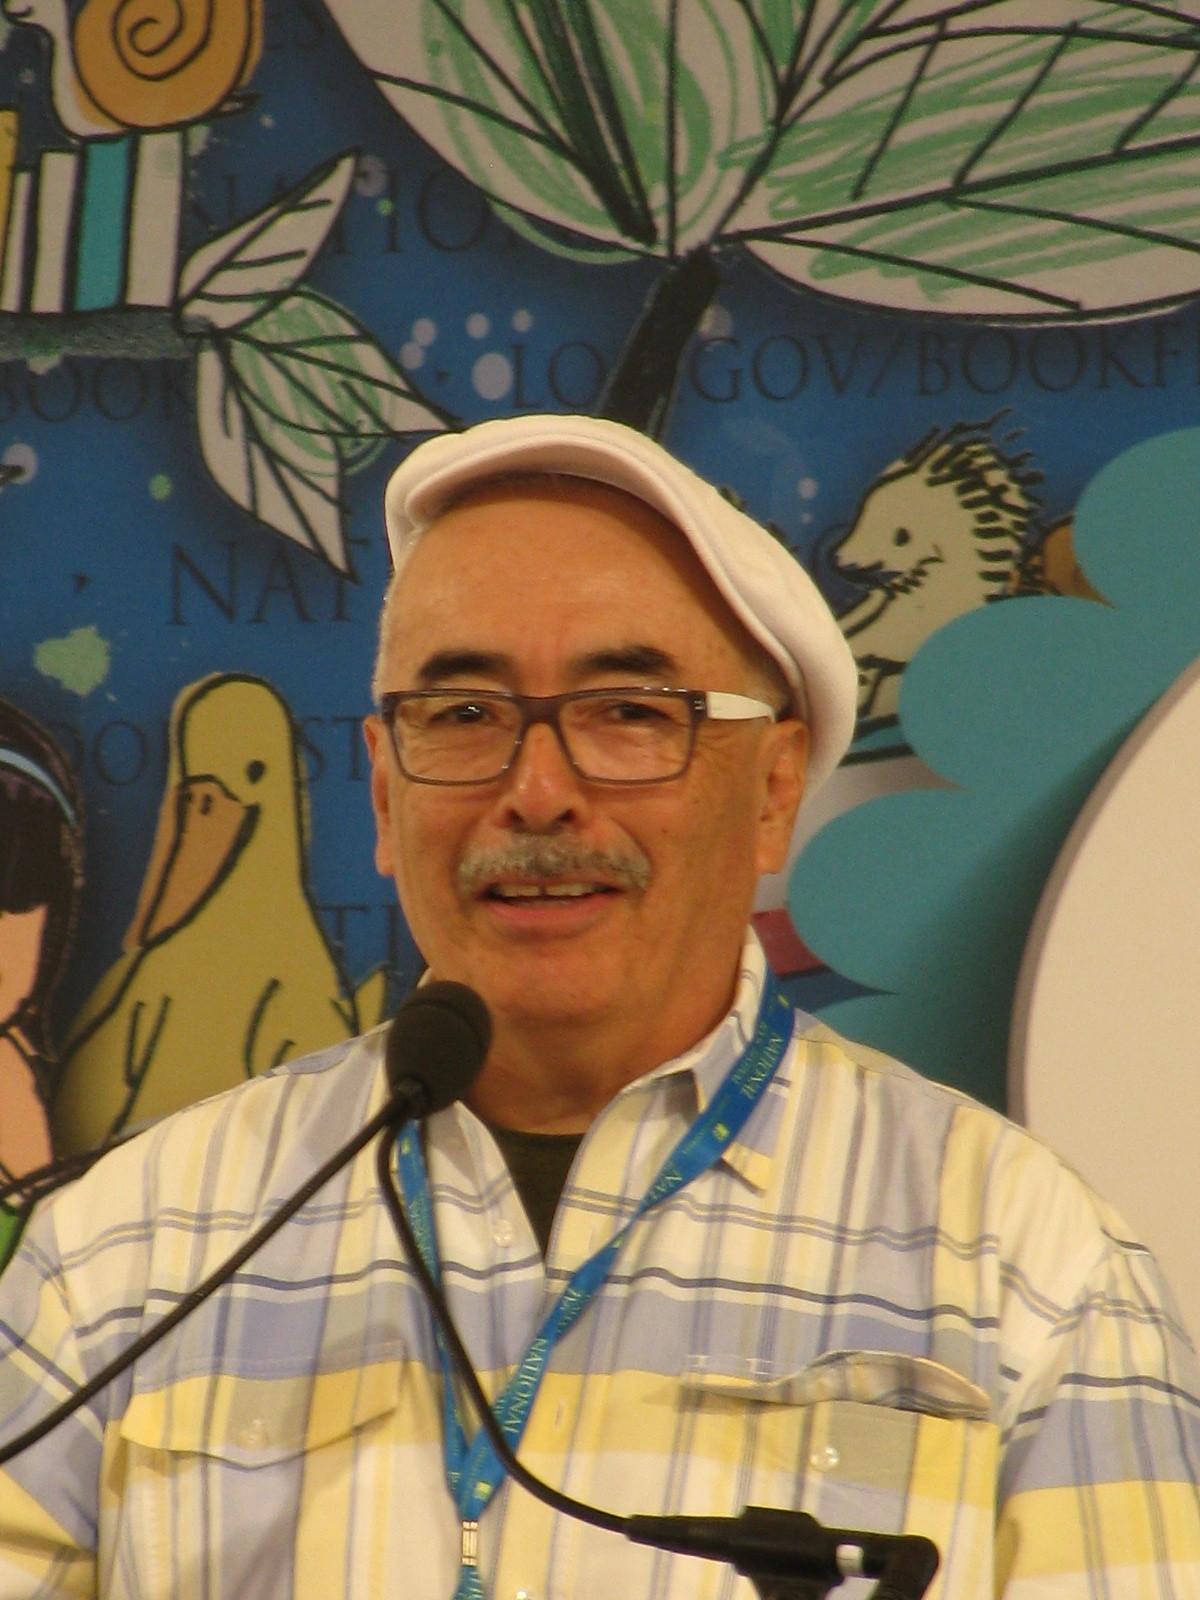 Meet U.S. Poet Laureate Juan Felipe Herrera